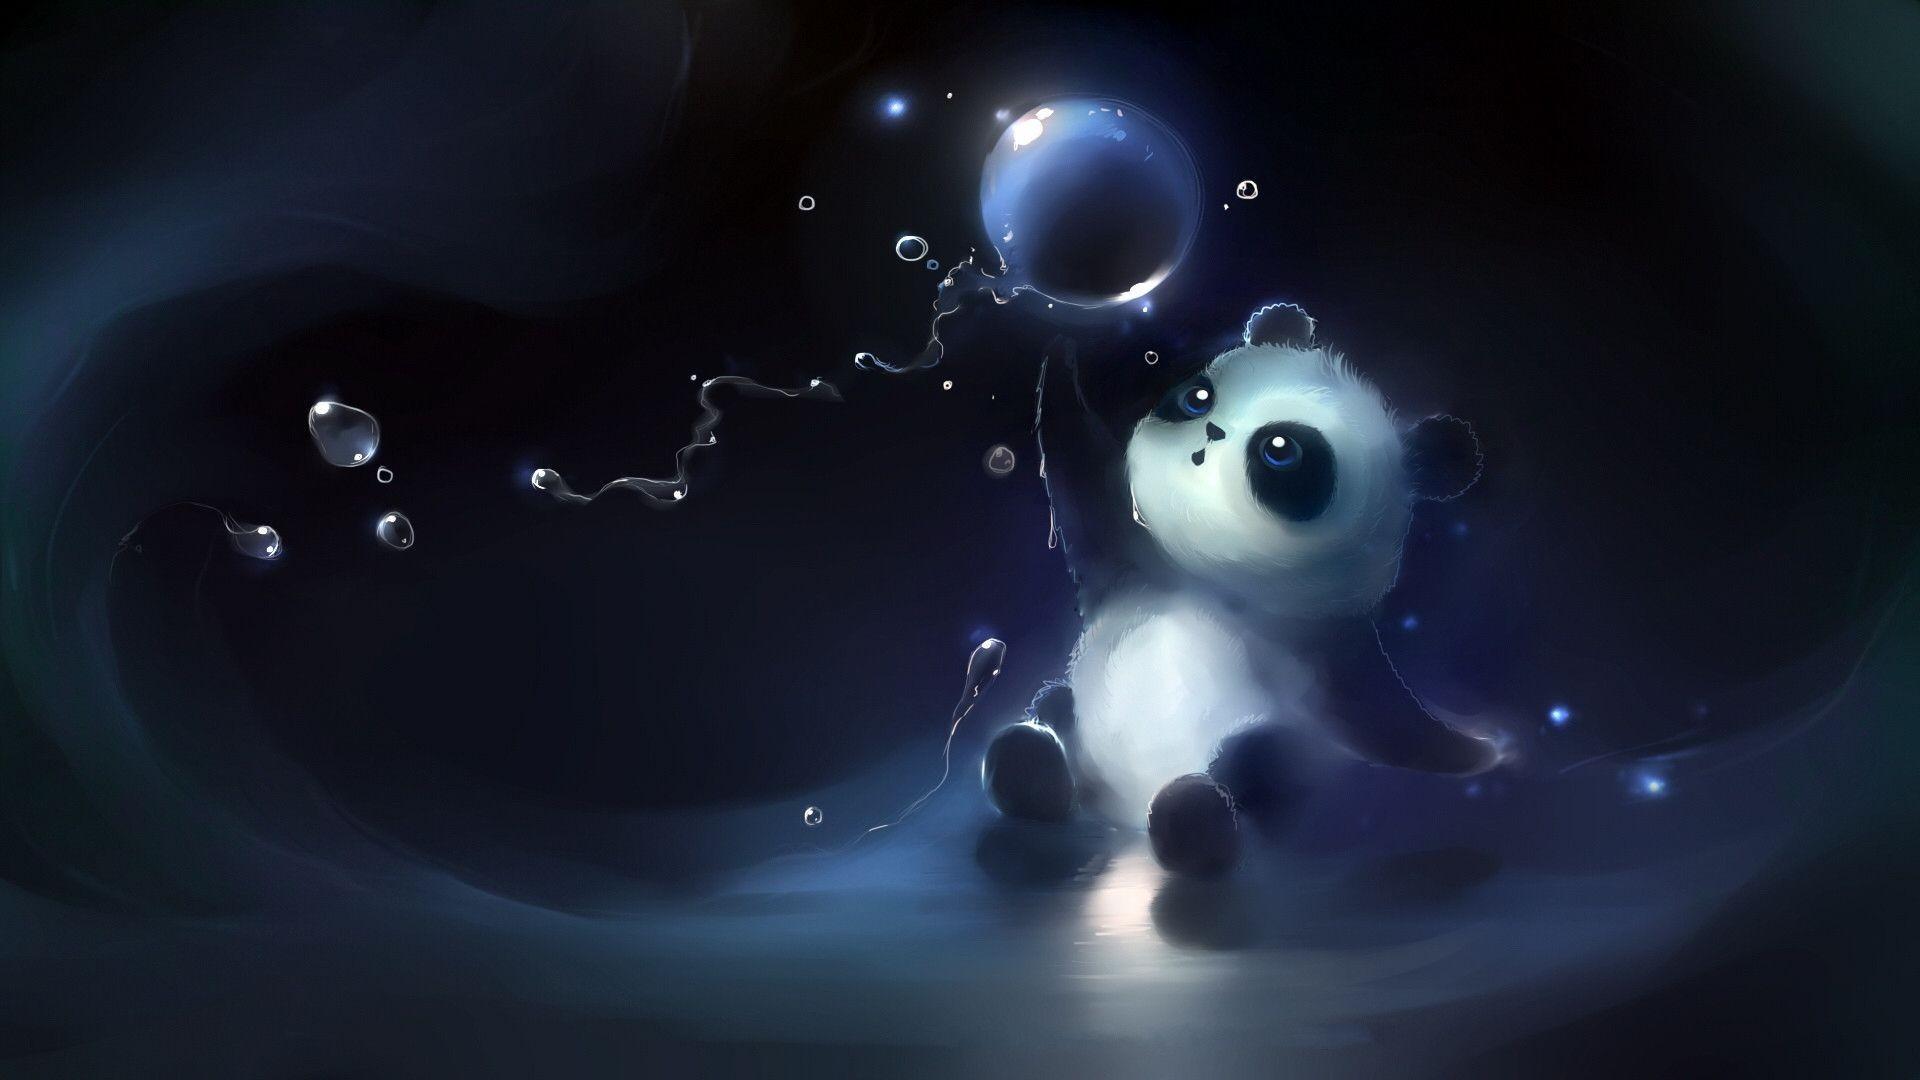 Res: 1920x1080, Animated Cute Panda Wallpaper